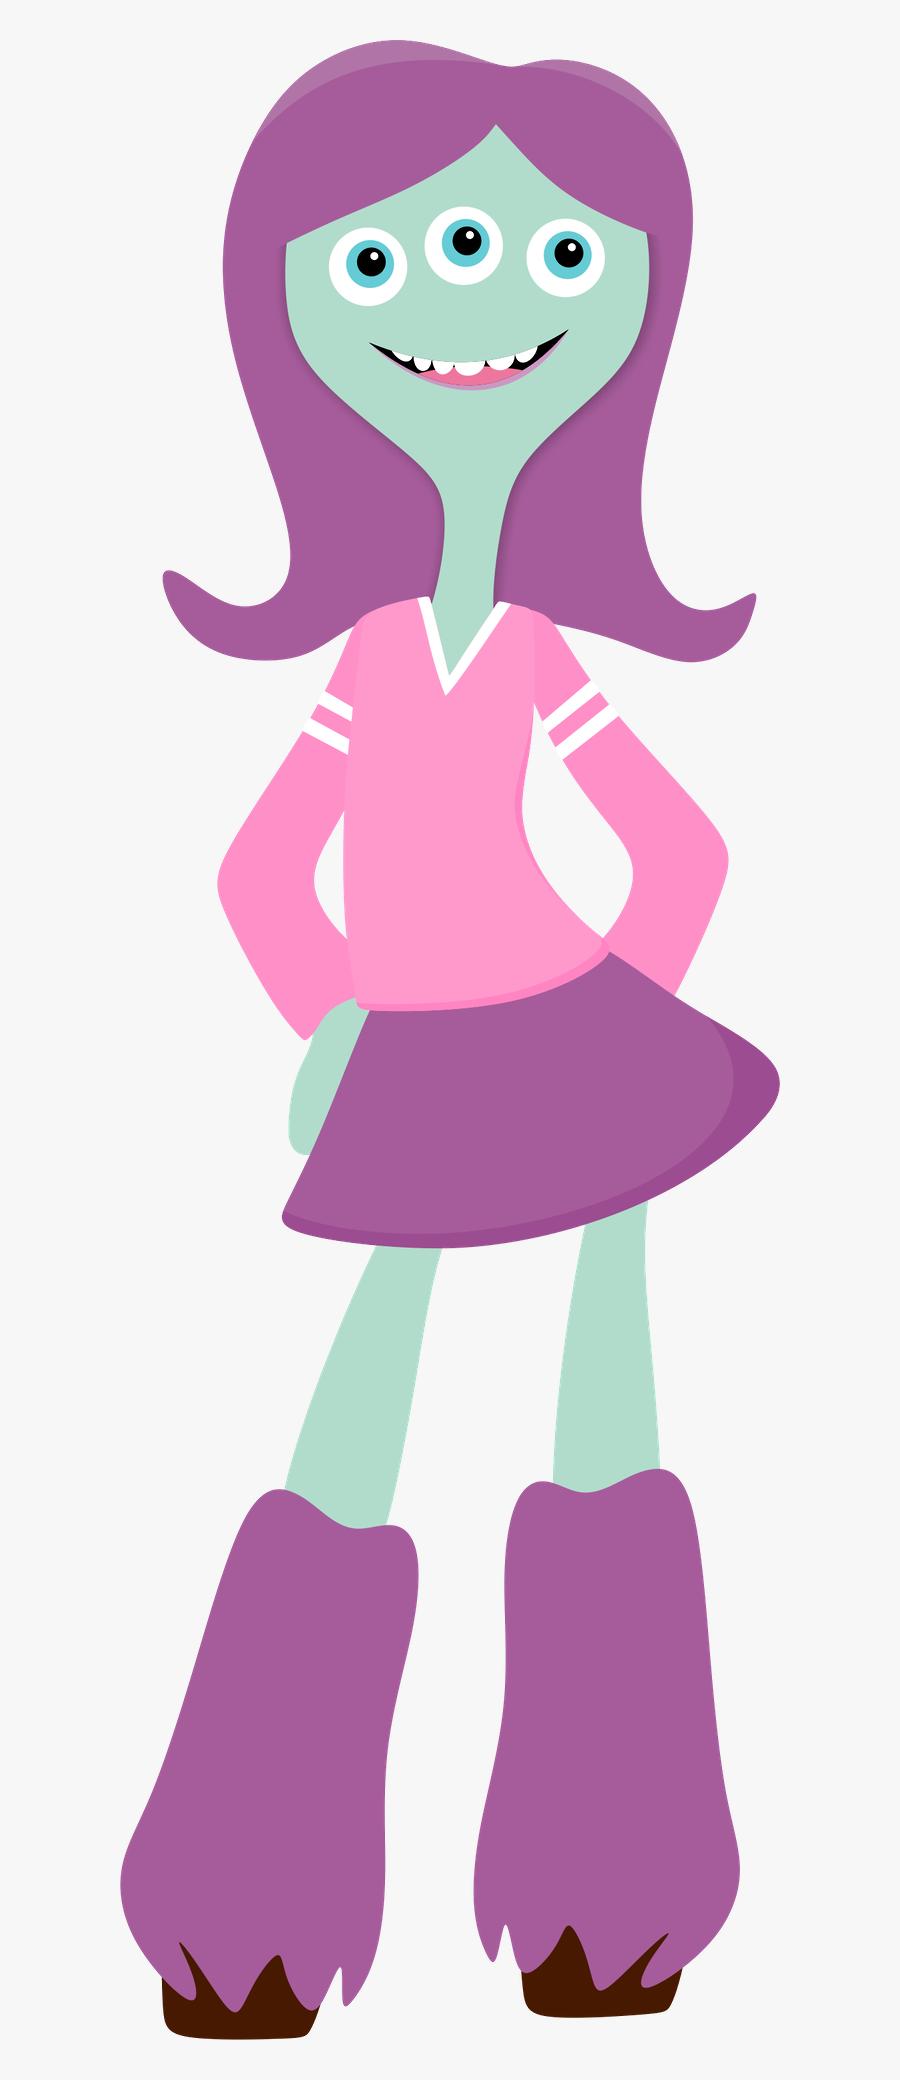 Transparent Monsters Inc Clipart - Monsters University Personajes Pink Animado, Transparent Clipart